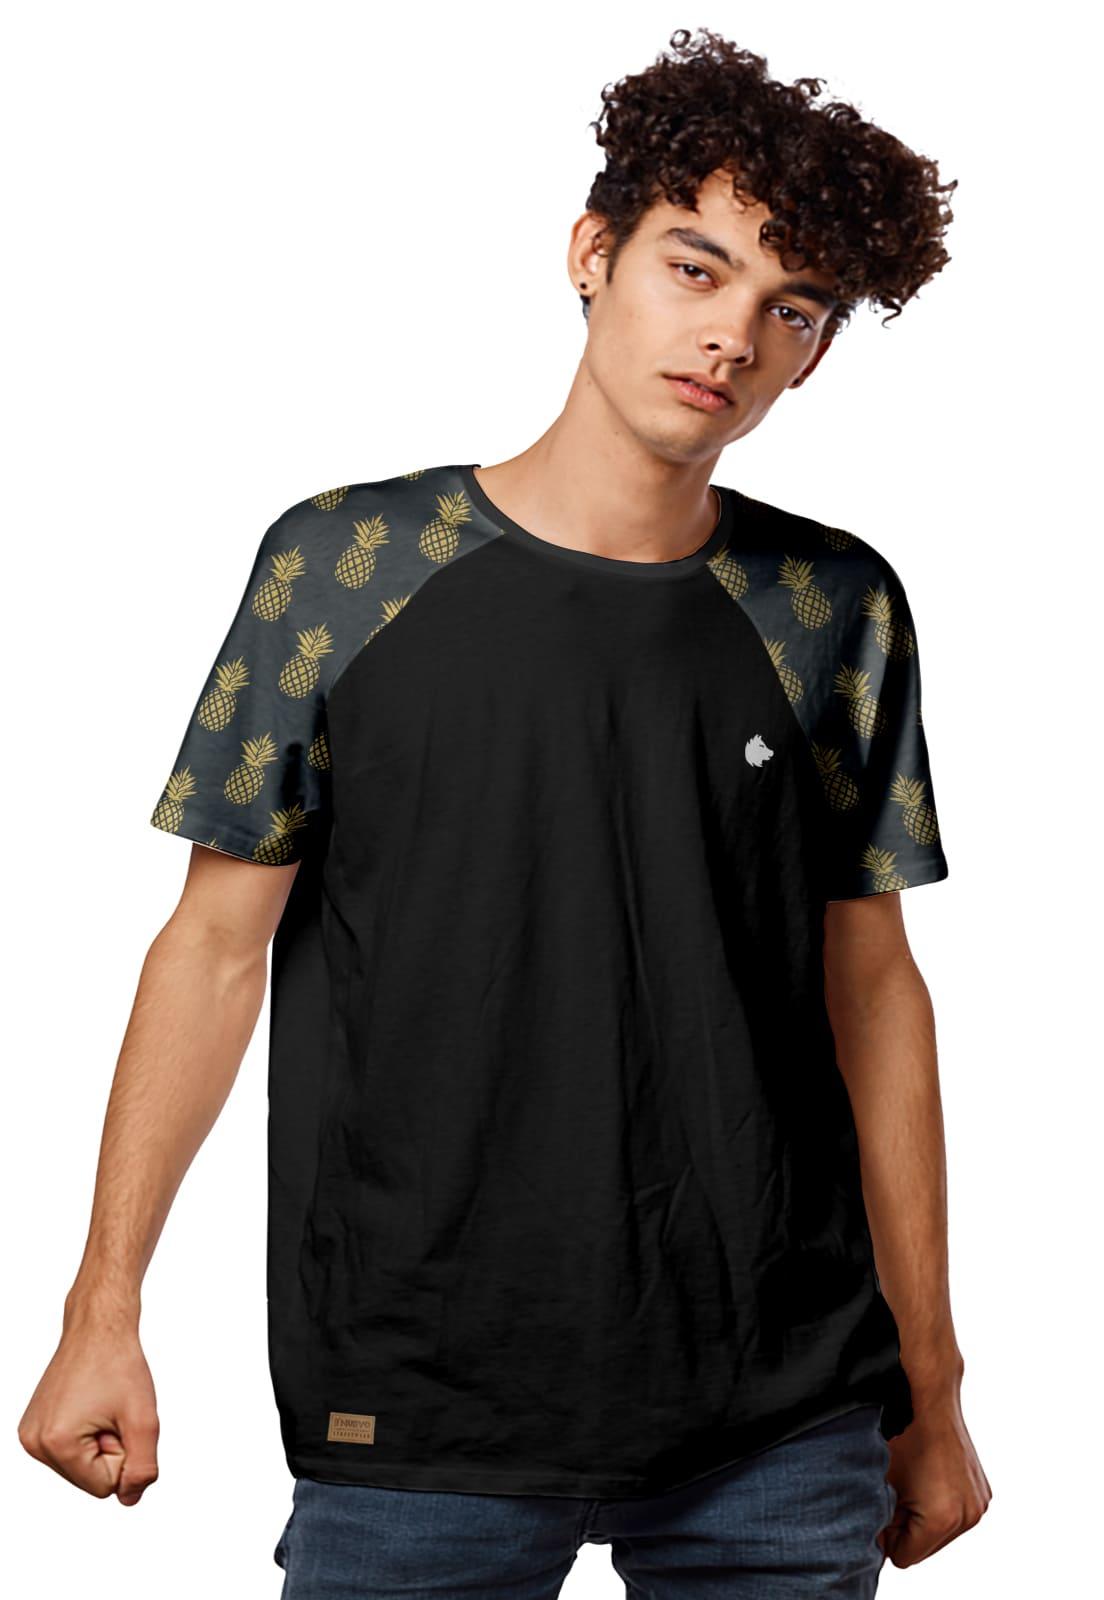 Camiseta Raglan Abacaxis Padrão Pineapple